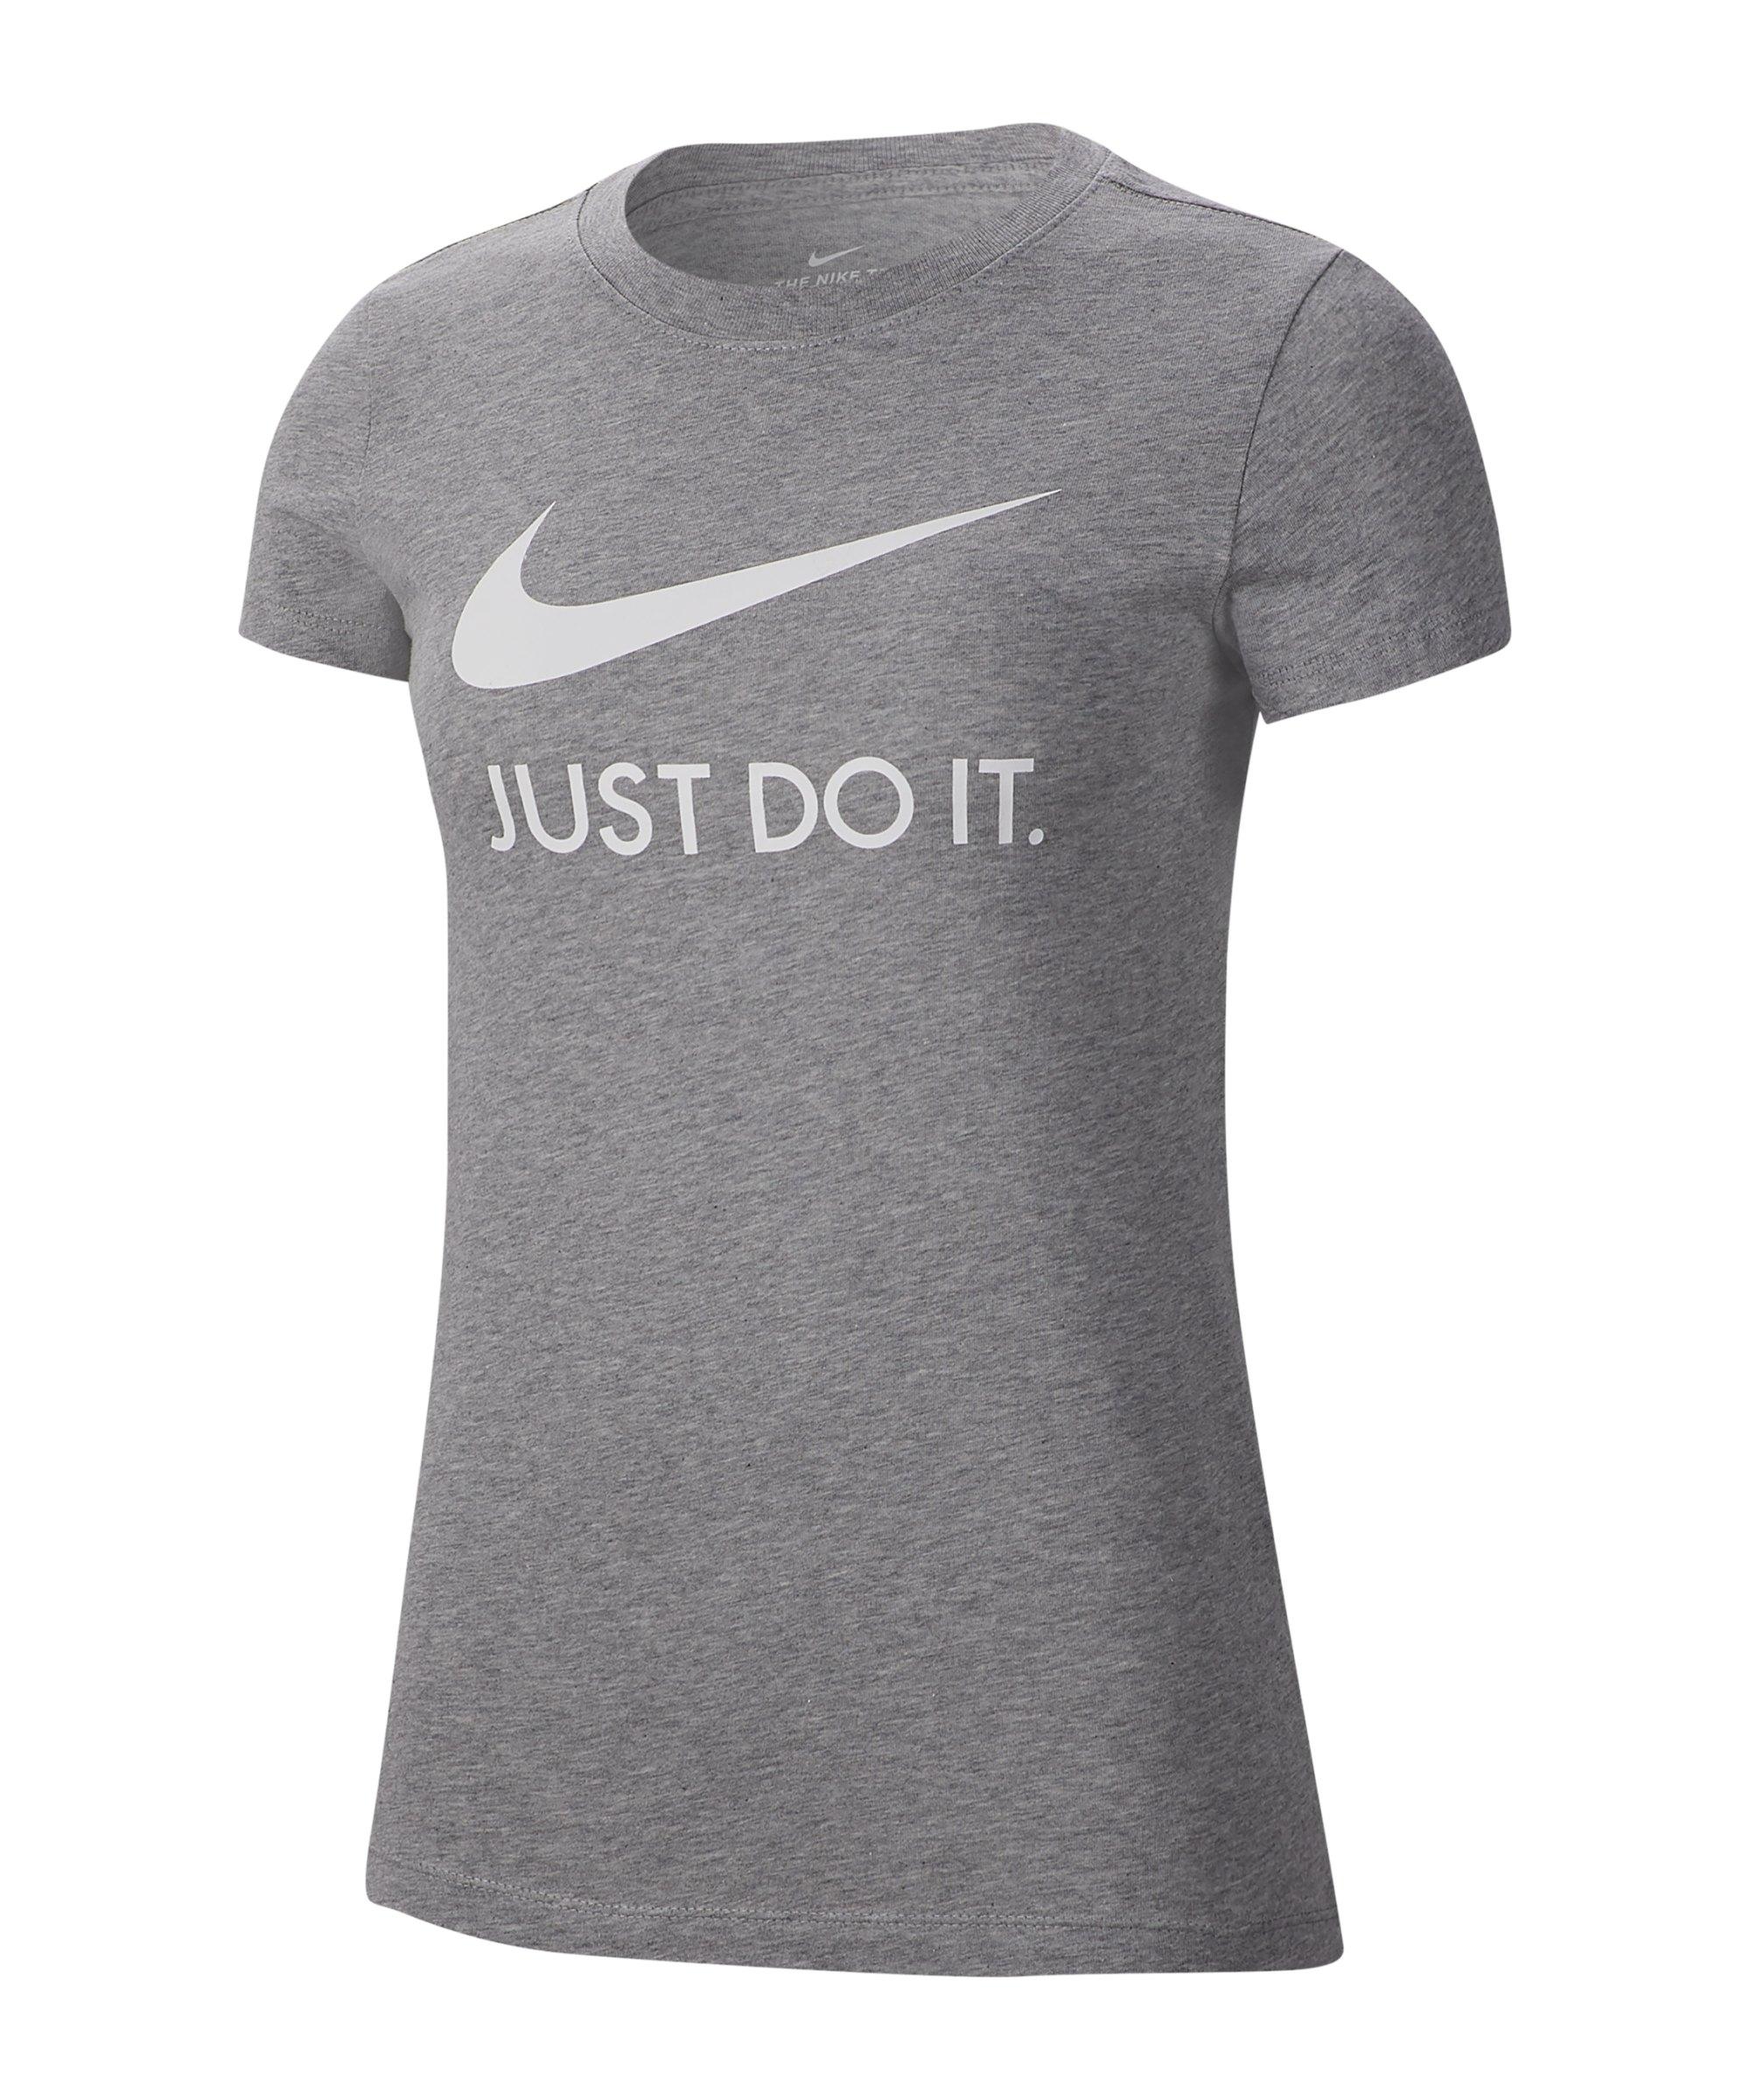 Nike JDI Print Tee T-Shirt Damen Grau F063 - grau